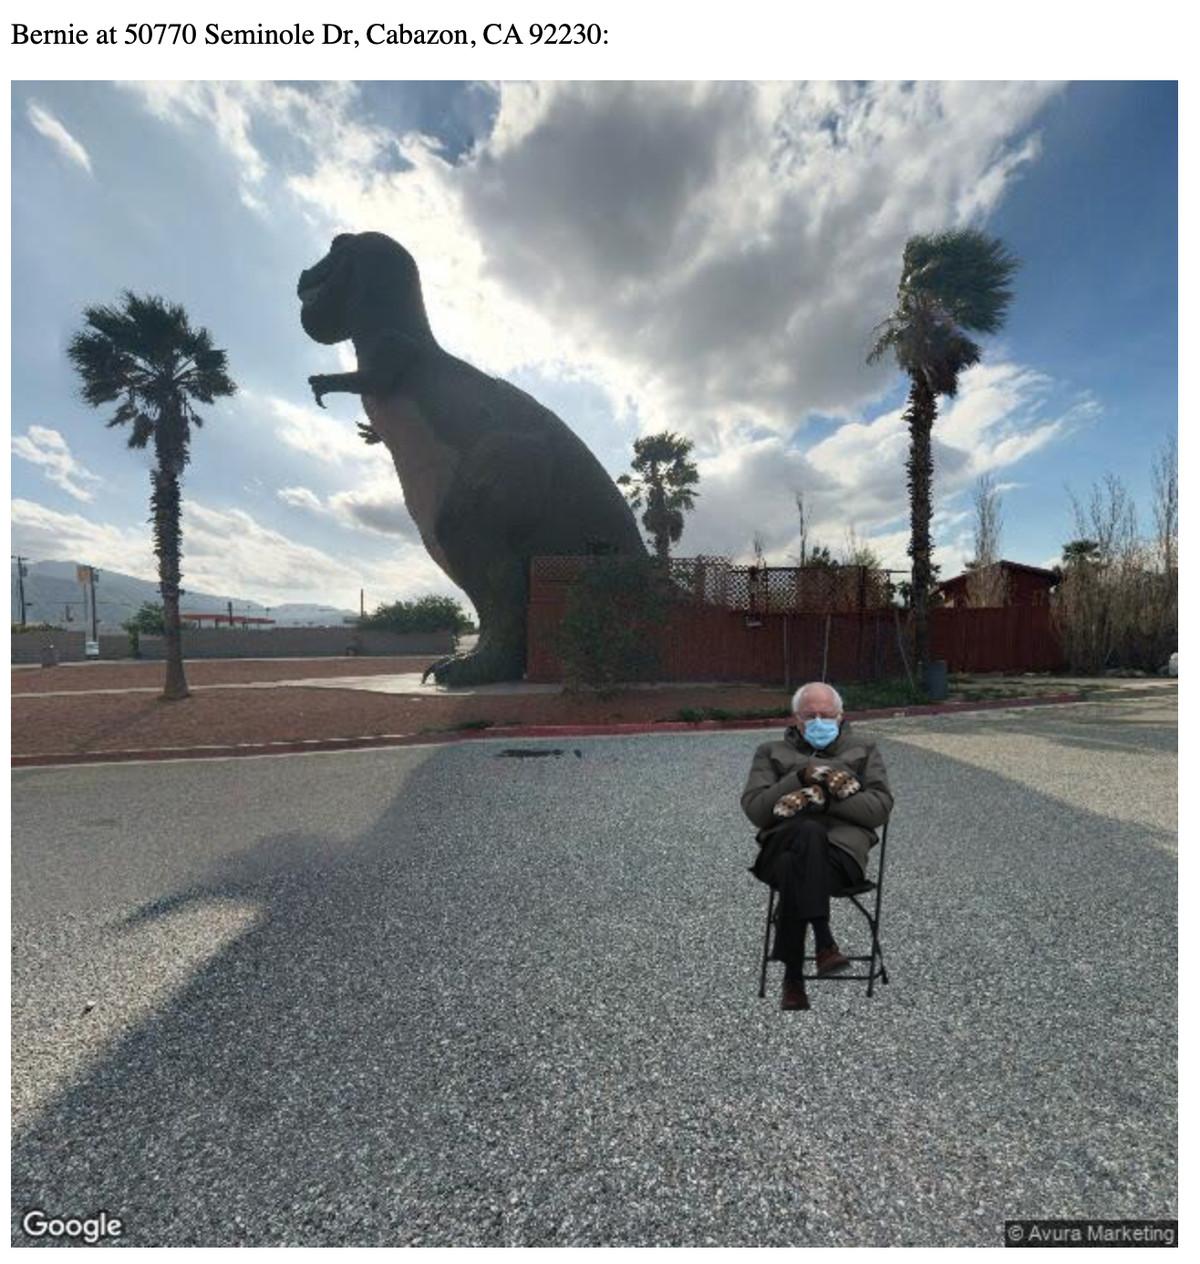 Bernie Sanders sitting in front of a t-rex statue